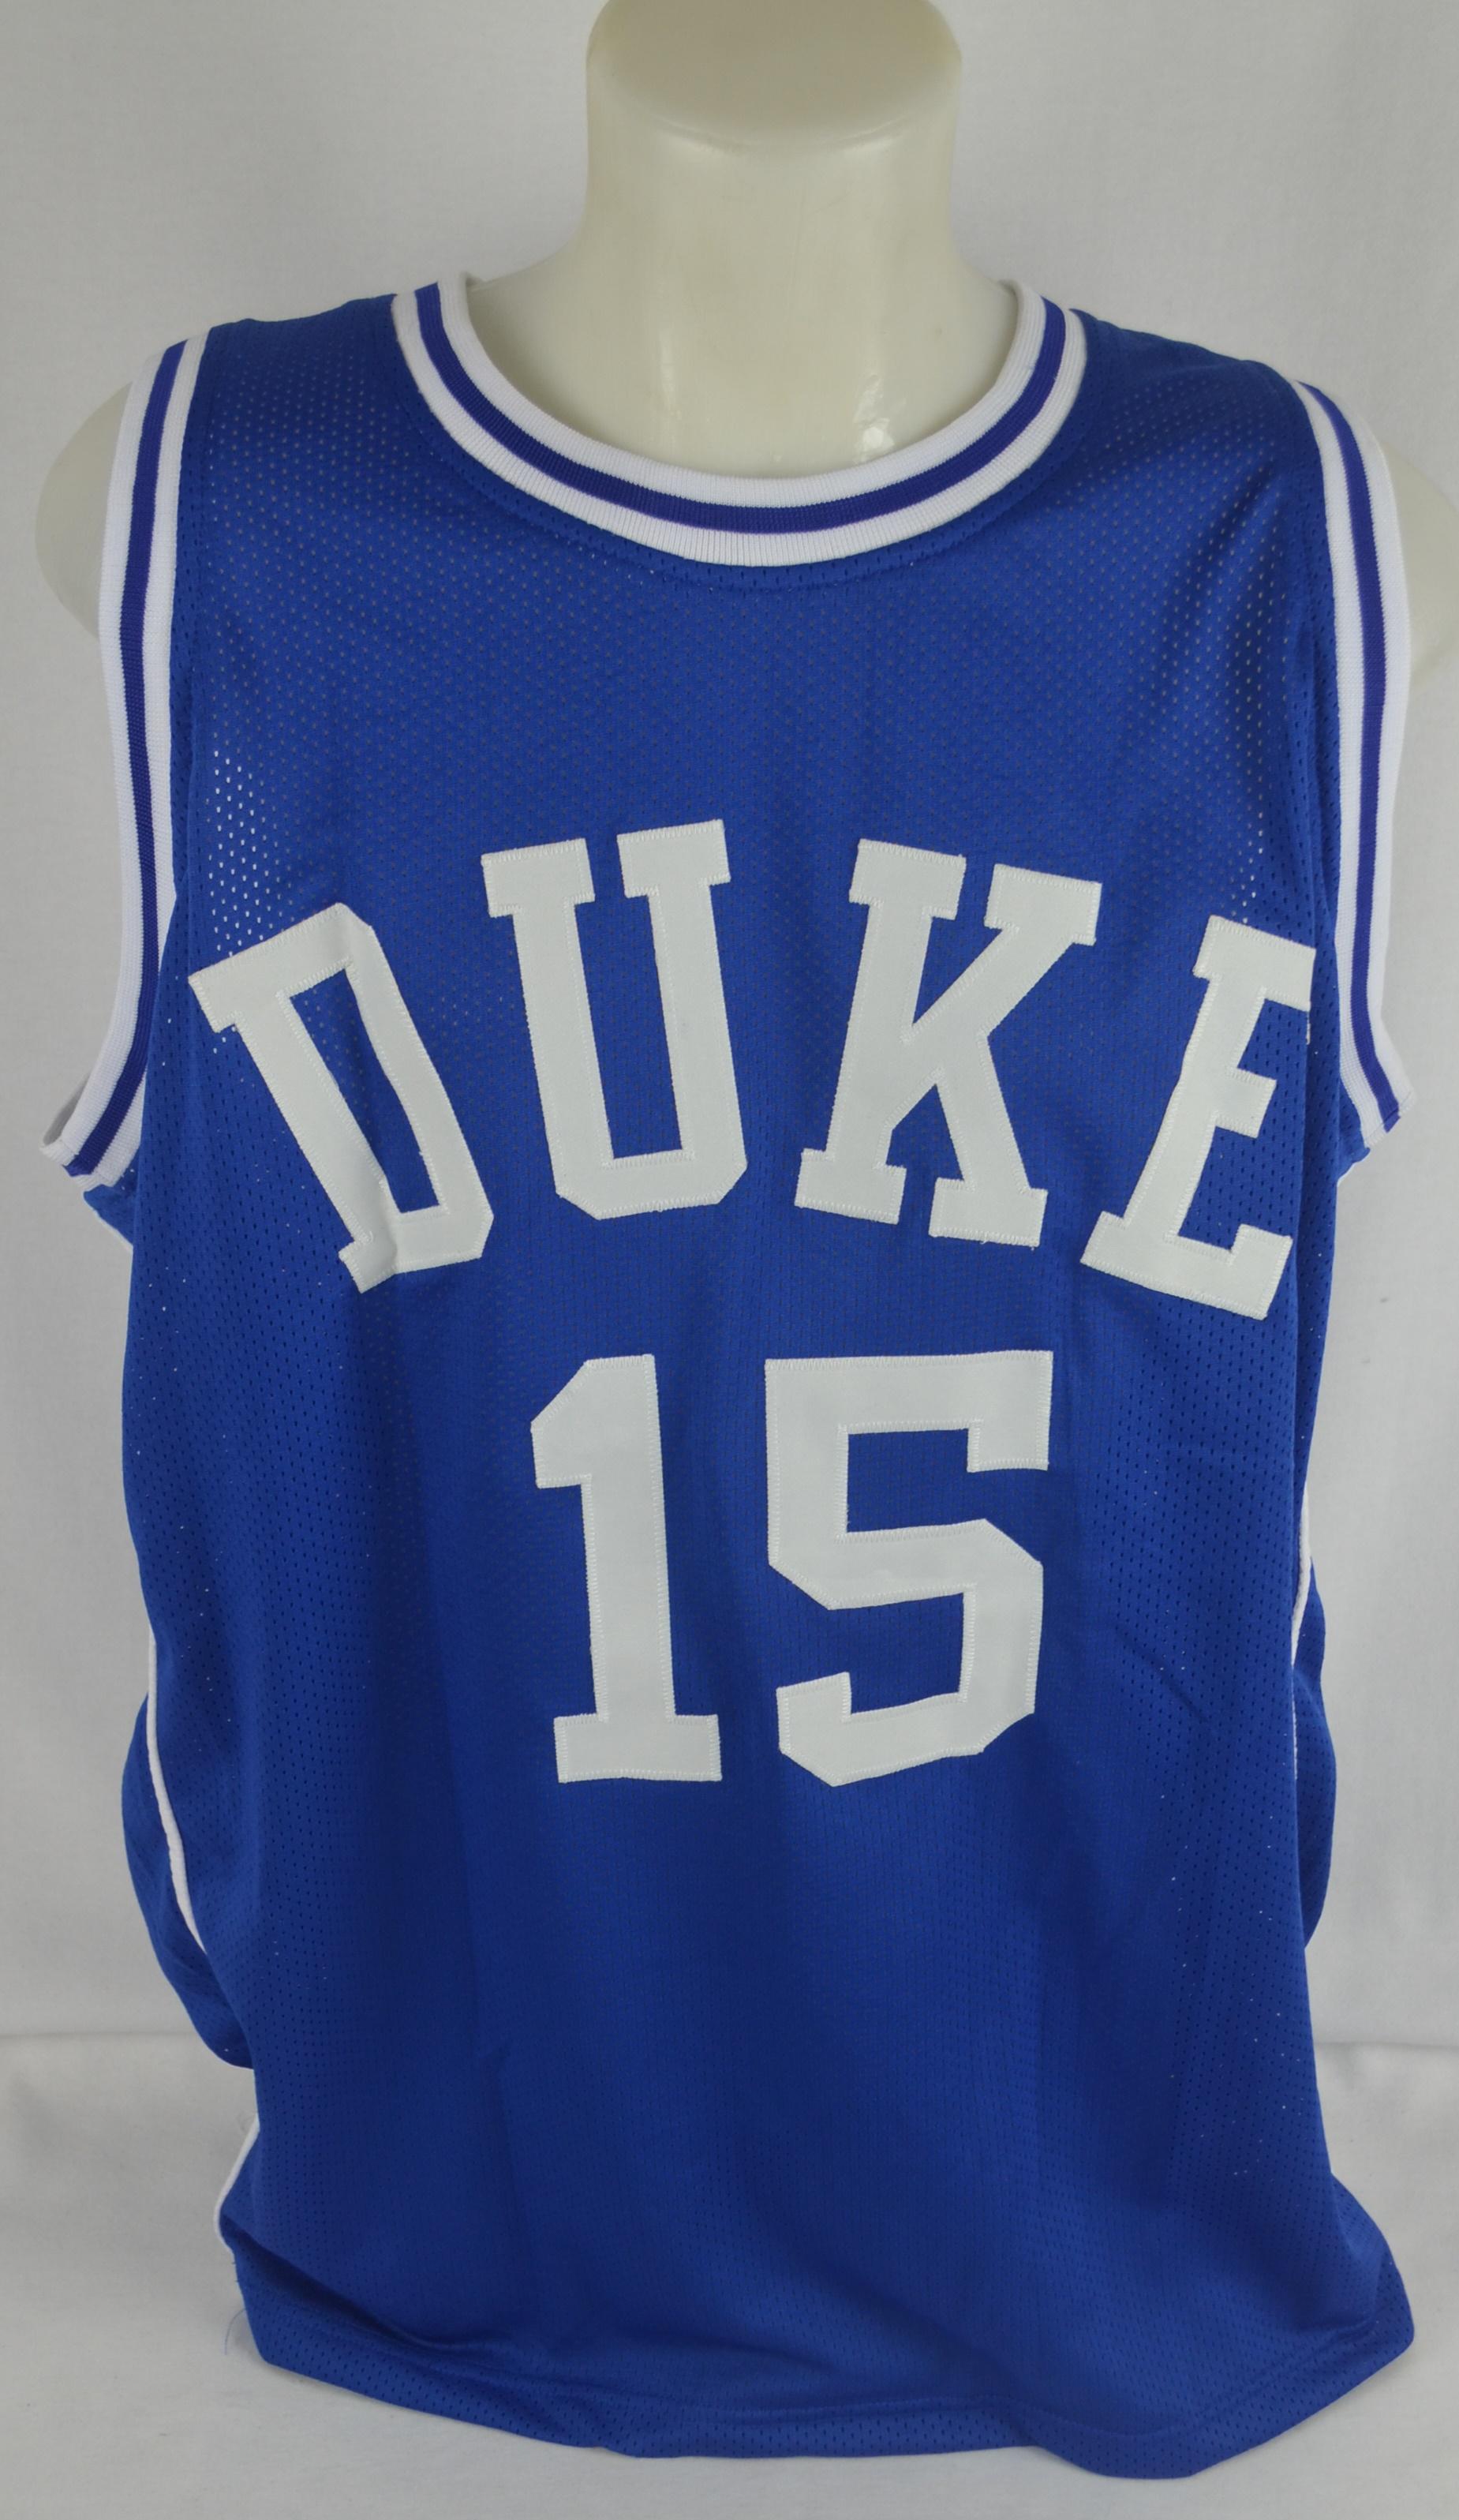 0fc93e22e773 ... Jahlil Okafor Autographed   Inscribed Duke Blue Devils Basketball  Jersey ...